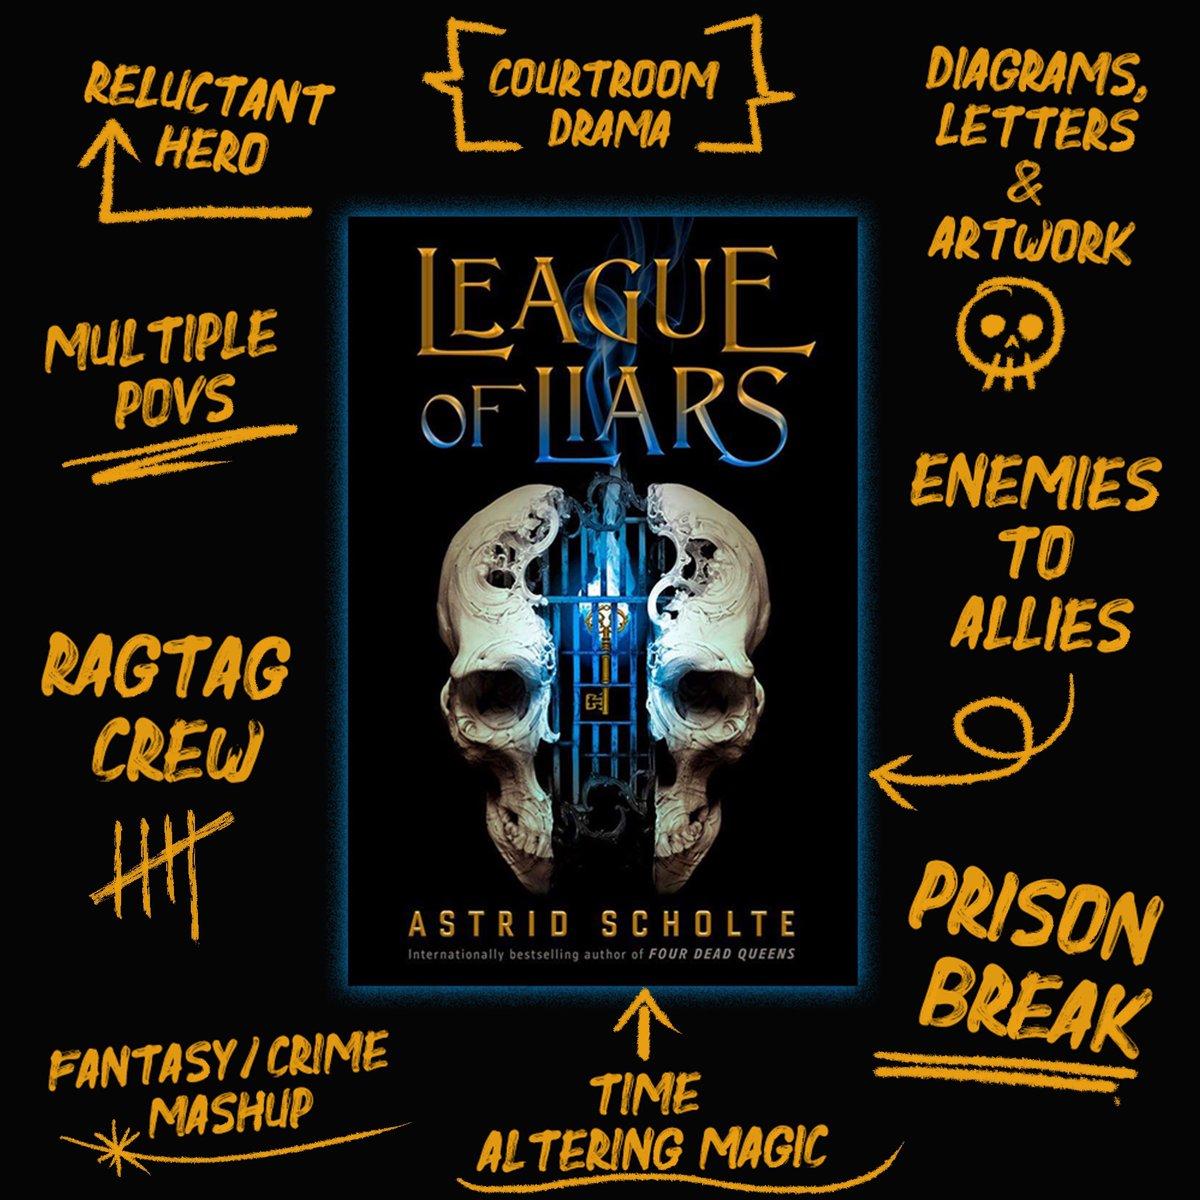 Astrid 💀te   League of Liars 💀🗝 Feb 20, 2020 AstridScholte ...